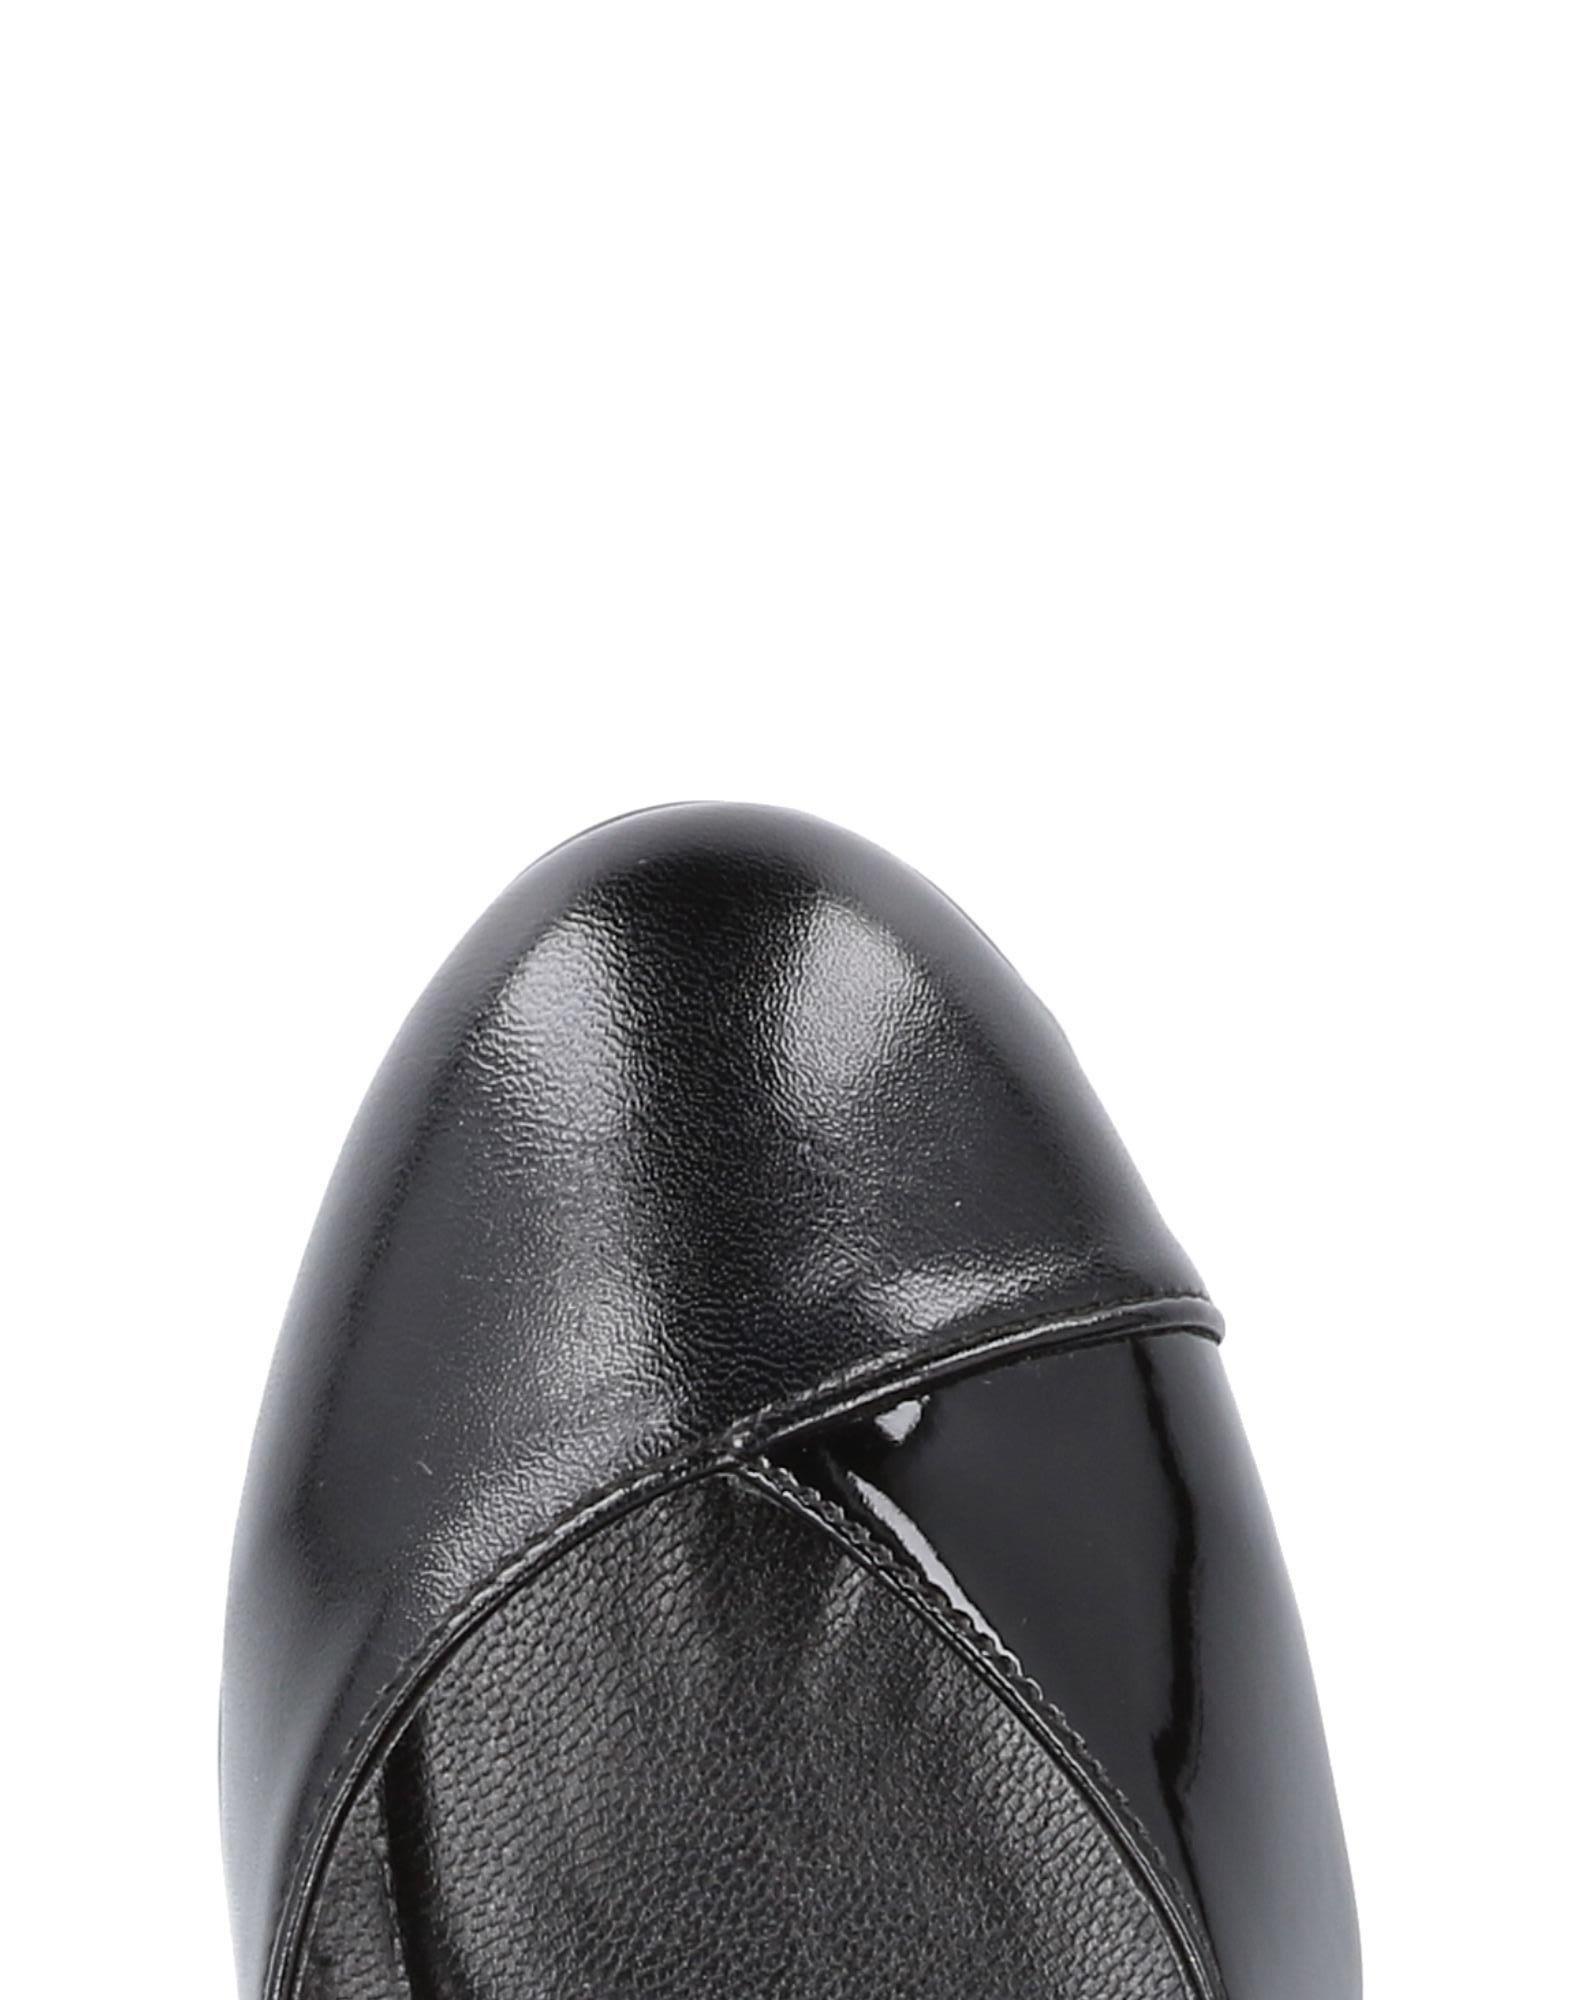 Sandro Ferrone Pumps Damen  Schuhe 11472394FL Gute Qualität beliebte Schuhe  39b3b0